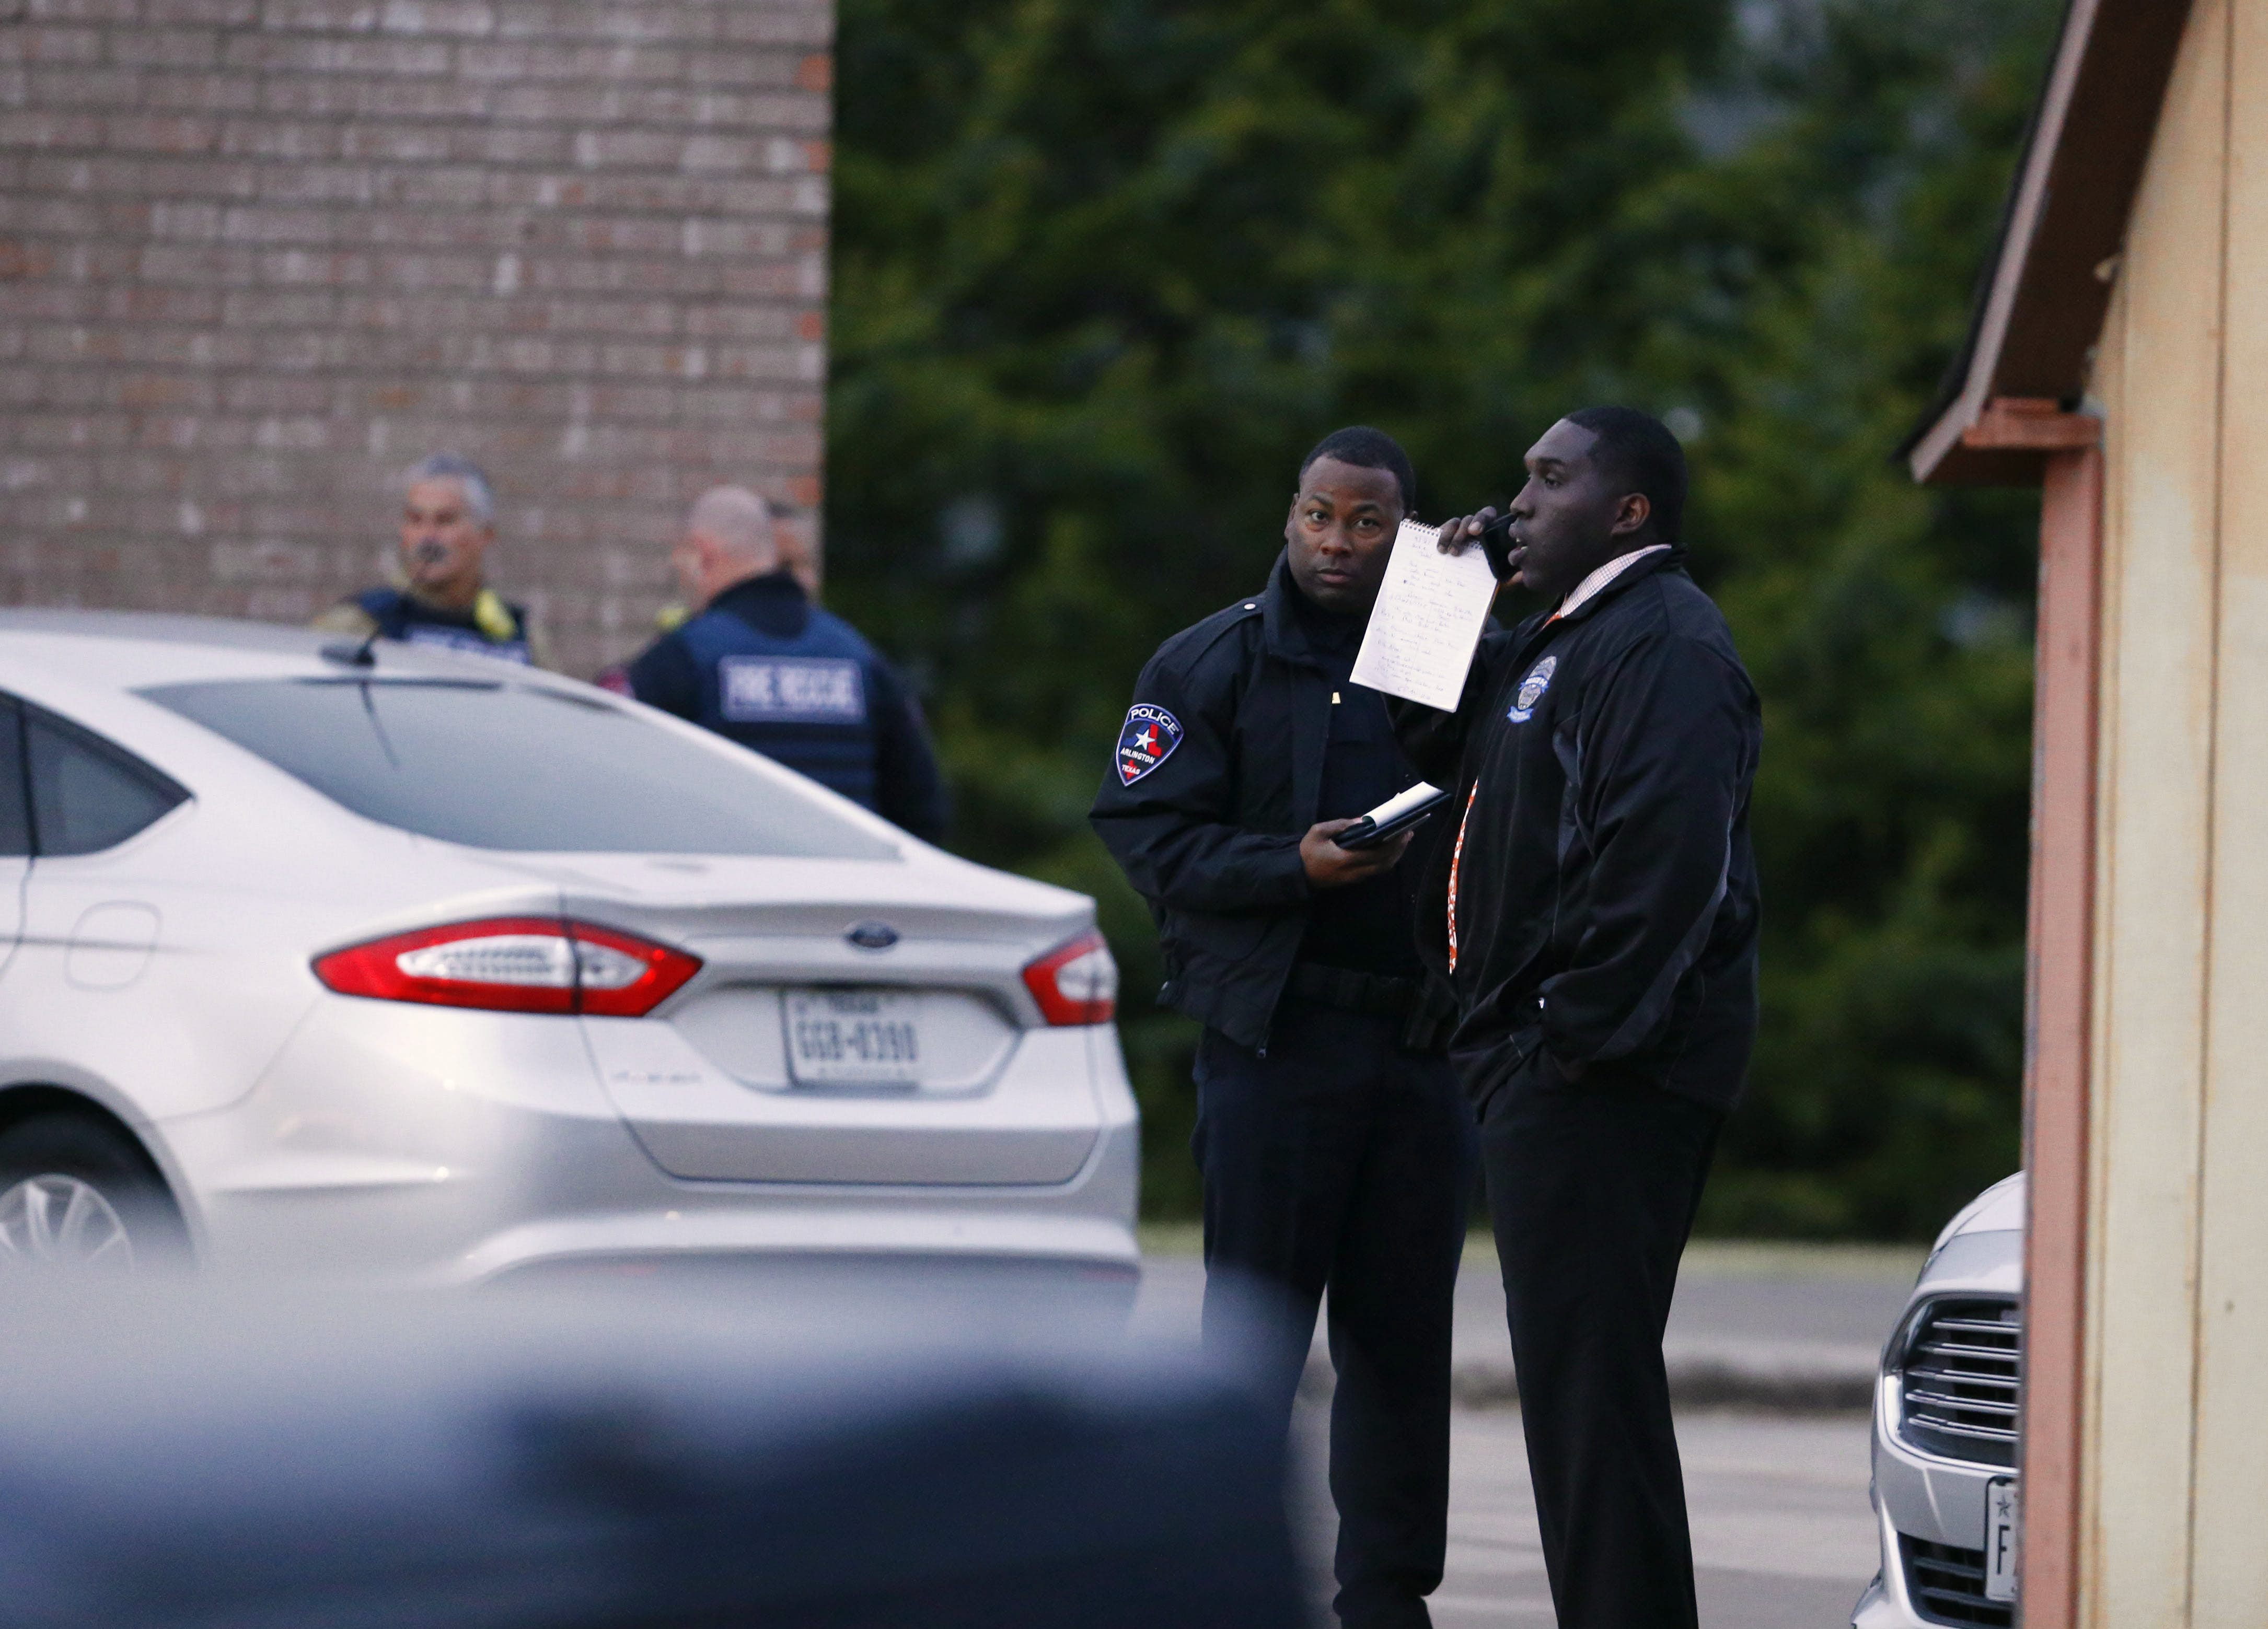 Gunman Who Shot Arlington Officers With Ar 15 Was No